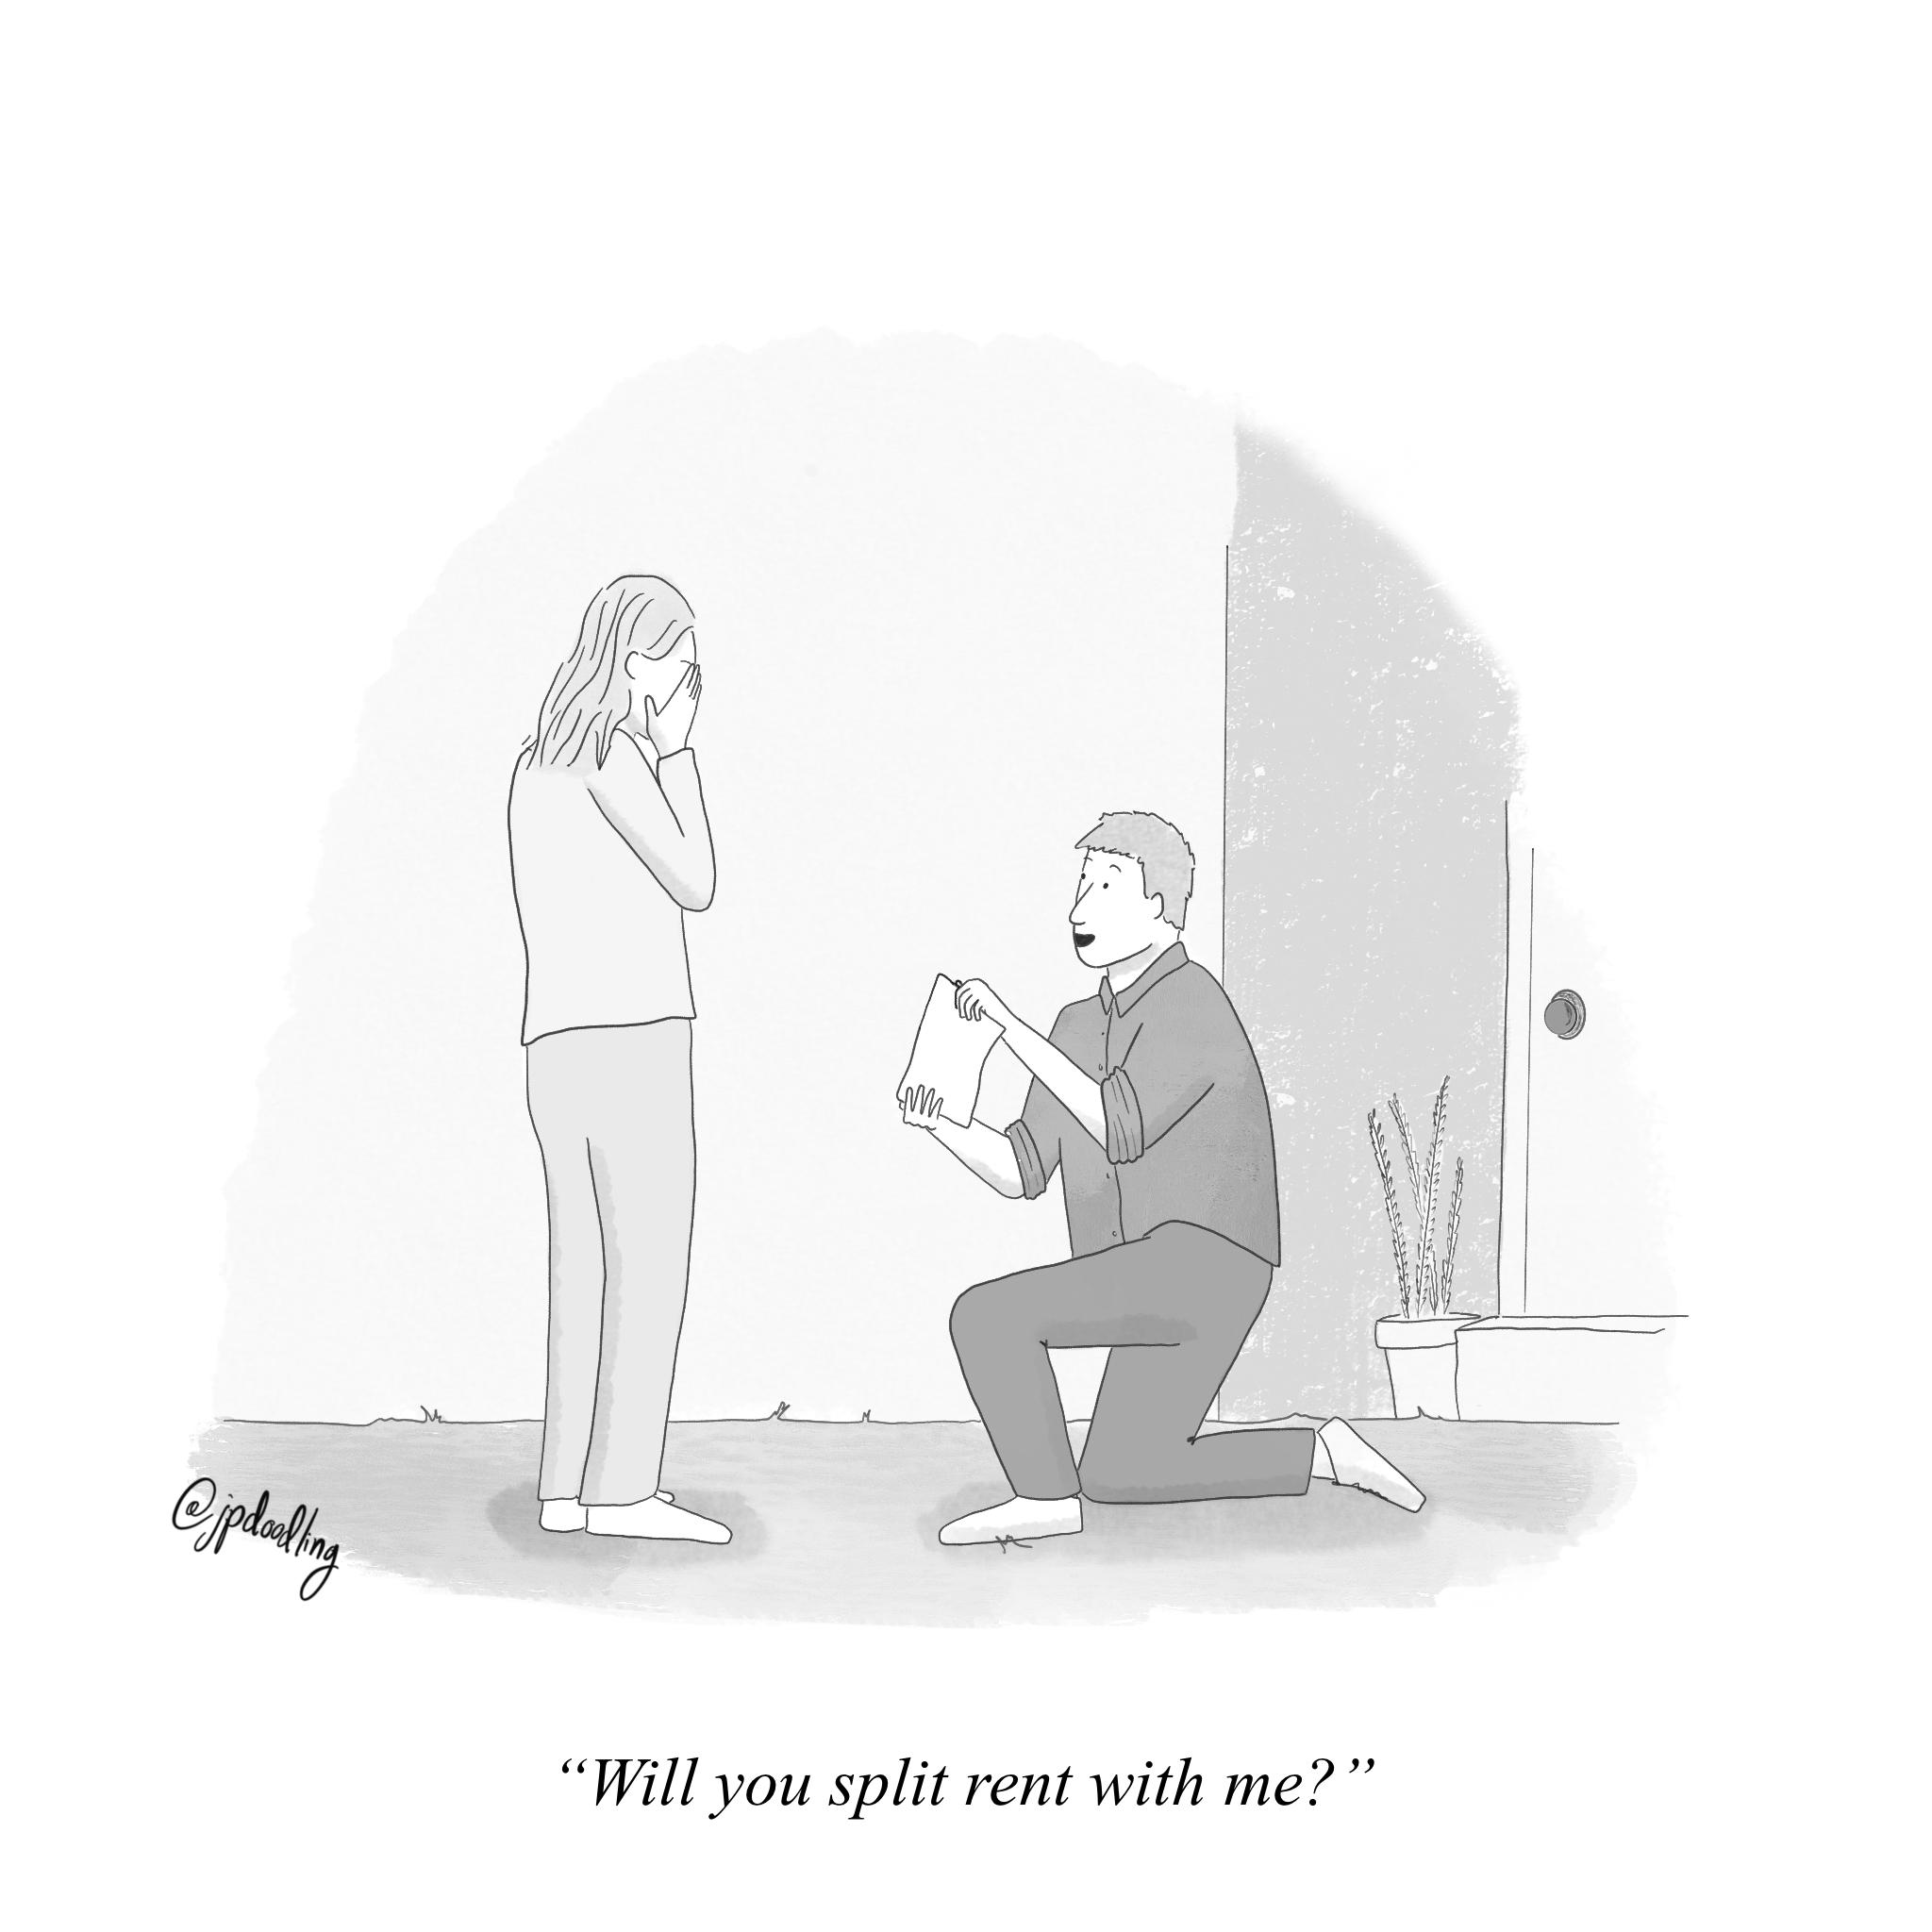 A Millenial Proposal IG: @jpdoodling